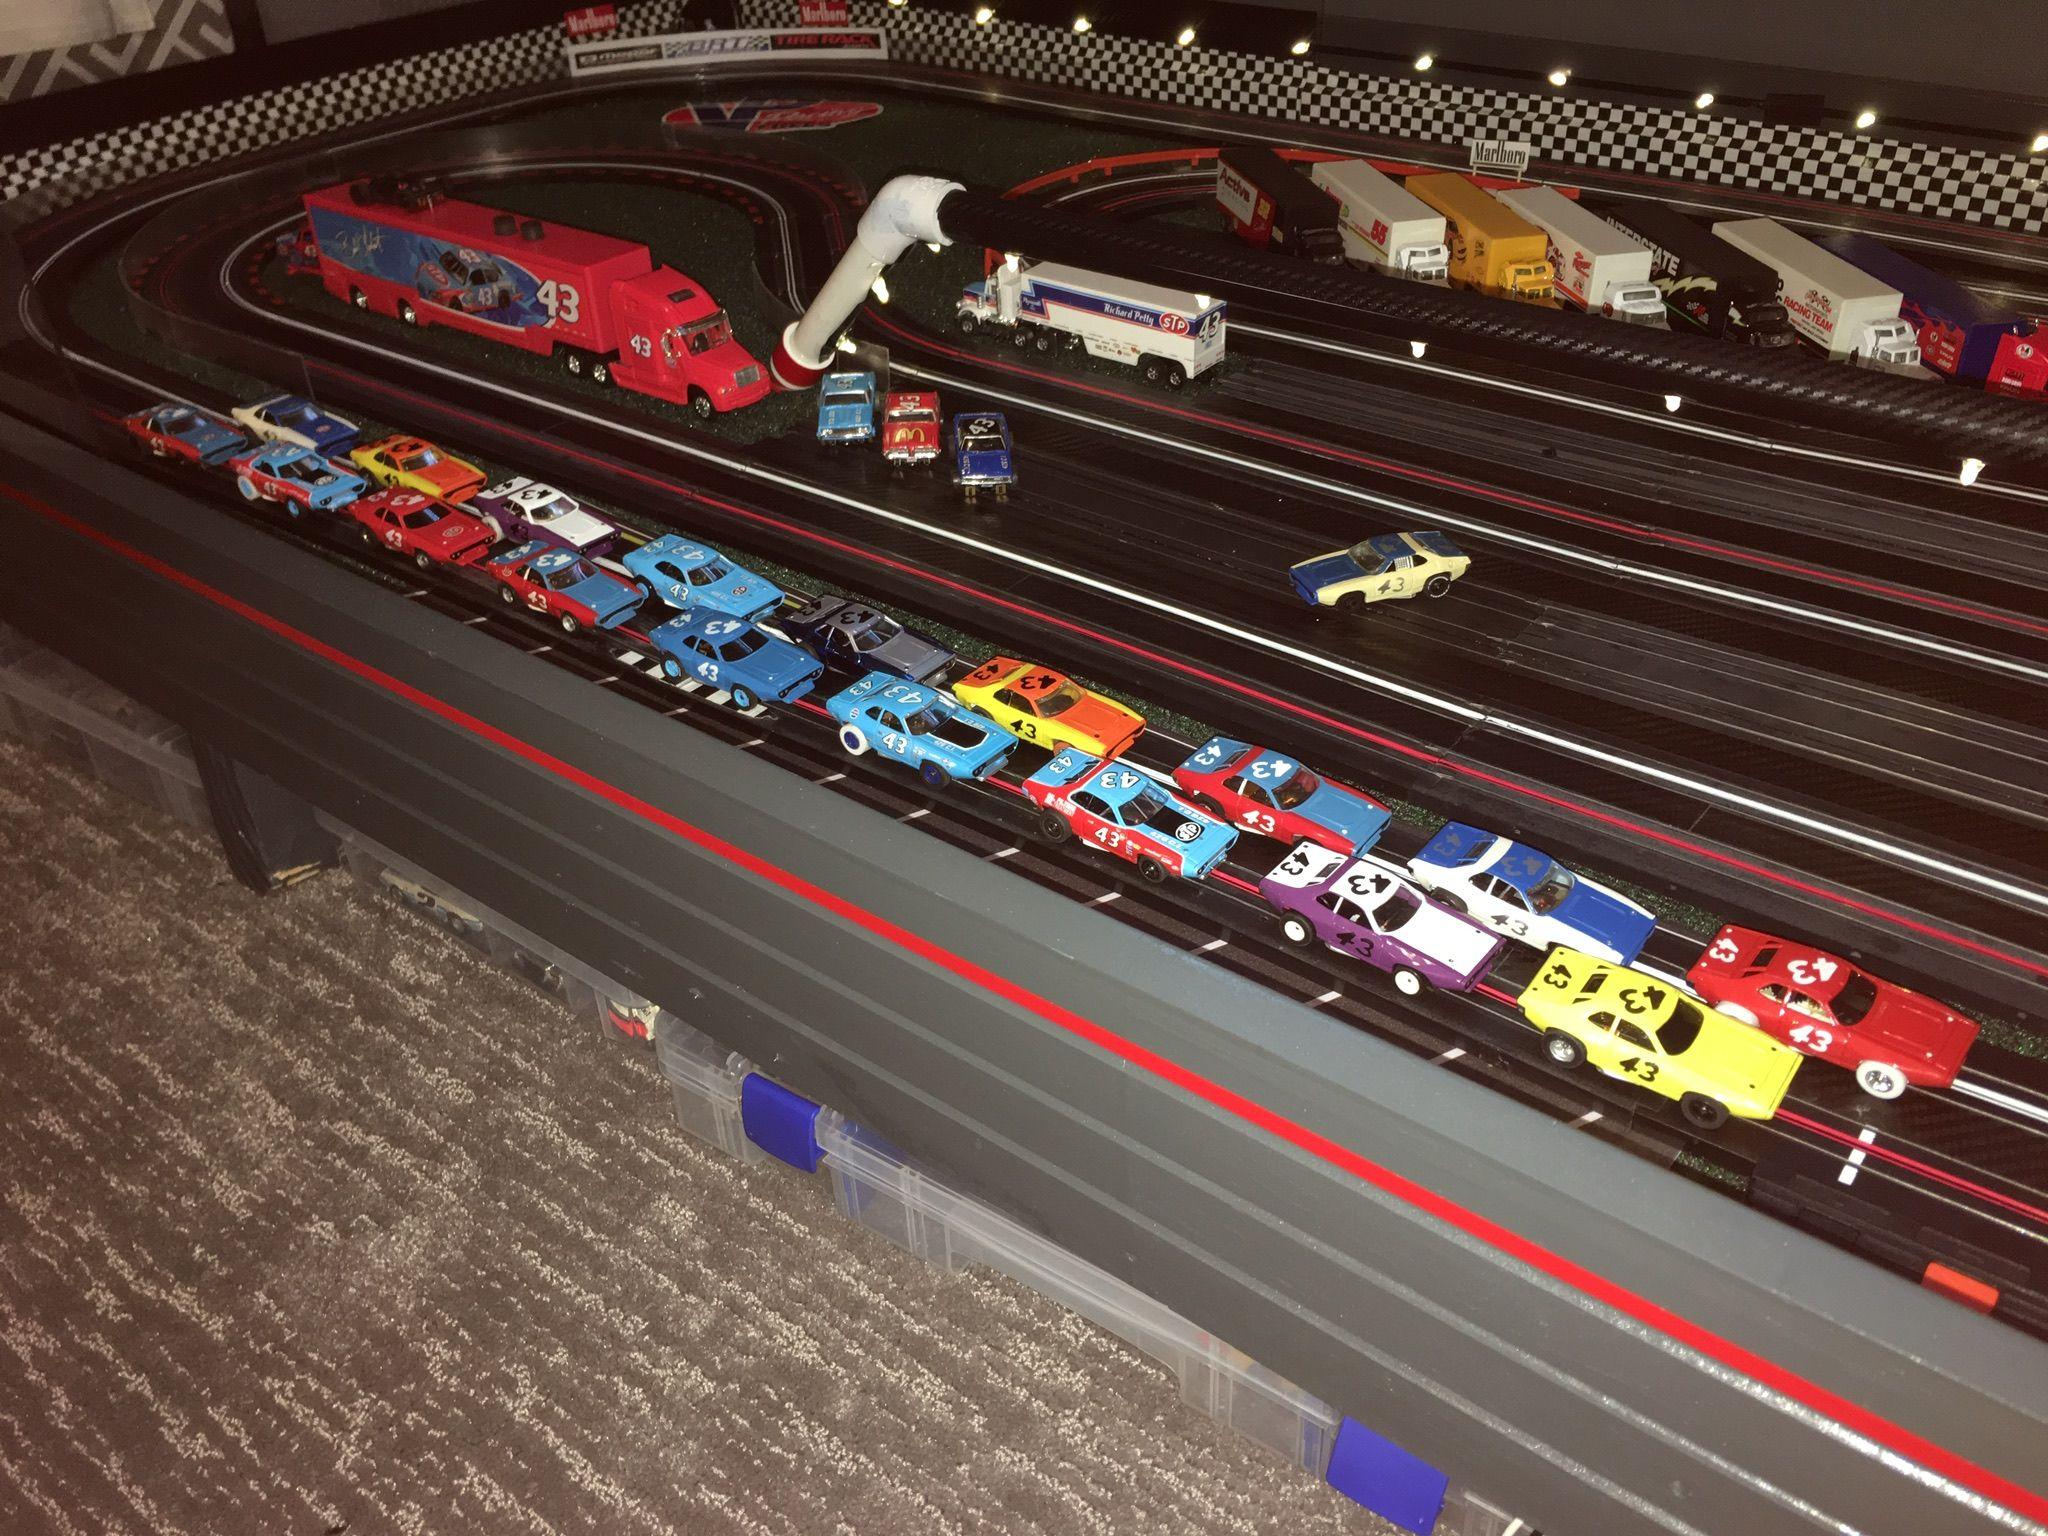 Pin By Jellyfish On Slot Cars Slot Car Tracks Ho Slot Cars Slot Car Racing